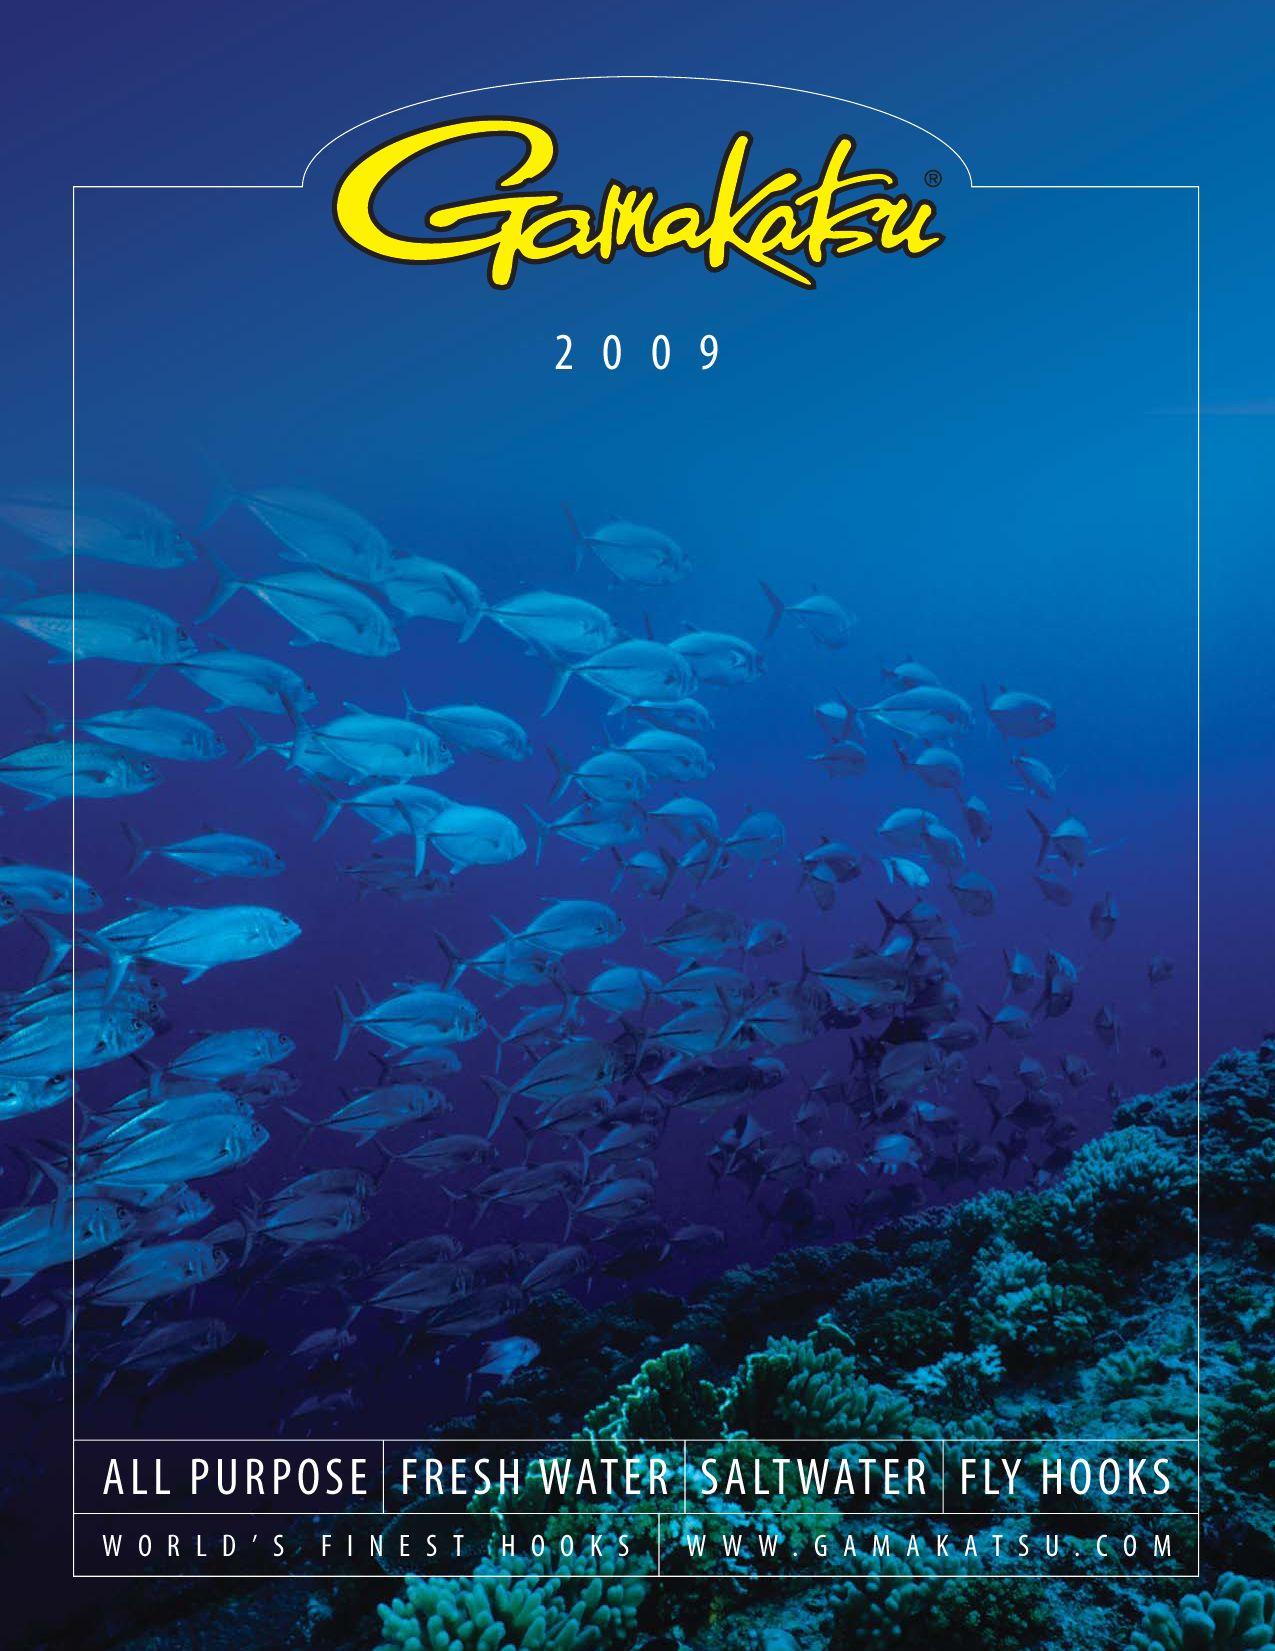 25 4//0 Aberdeen hook 1//4oz Saltwater Jig Heads for Trout,Redfish,Flounder